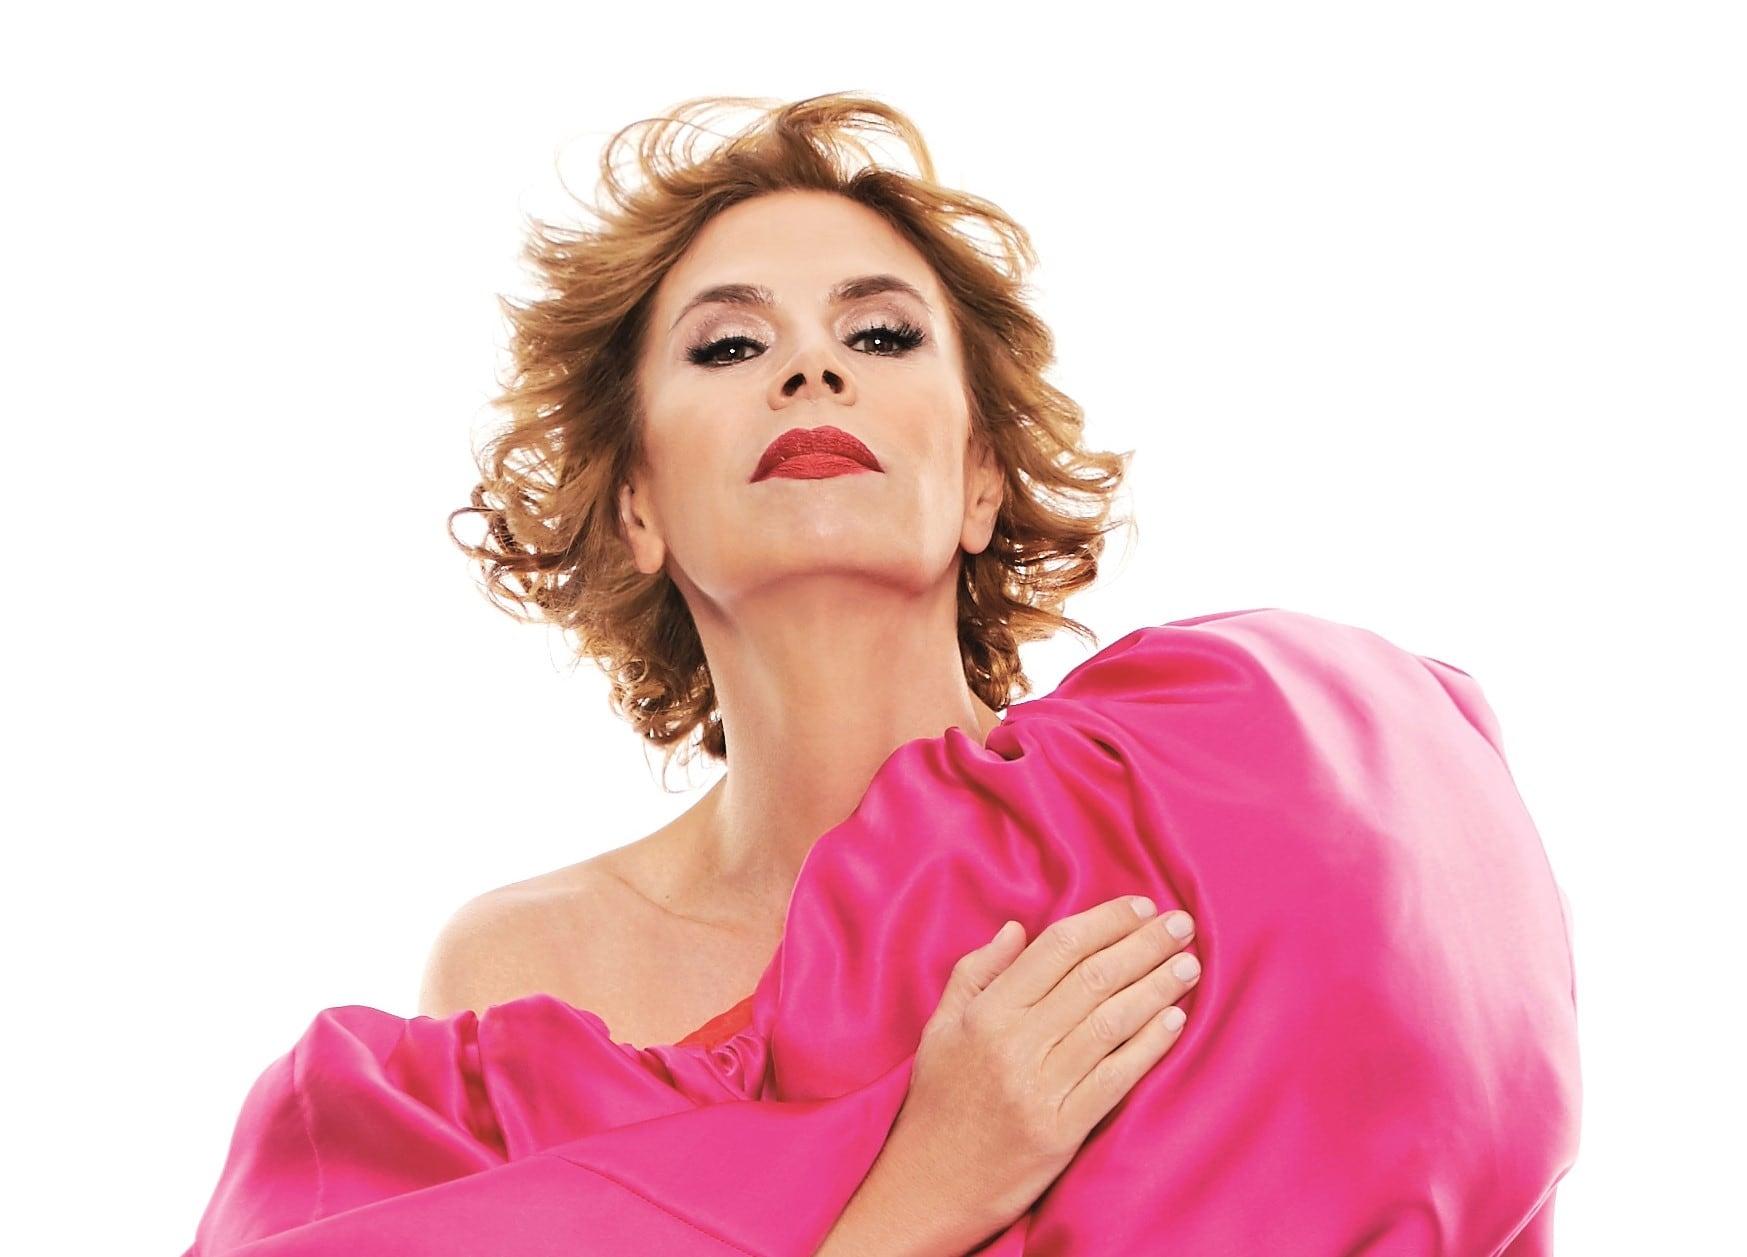 Entrevista de Ágata Ruiz de la Prada para revista Influencers